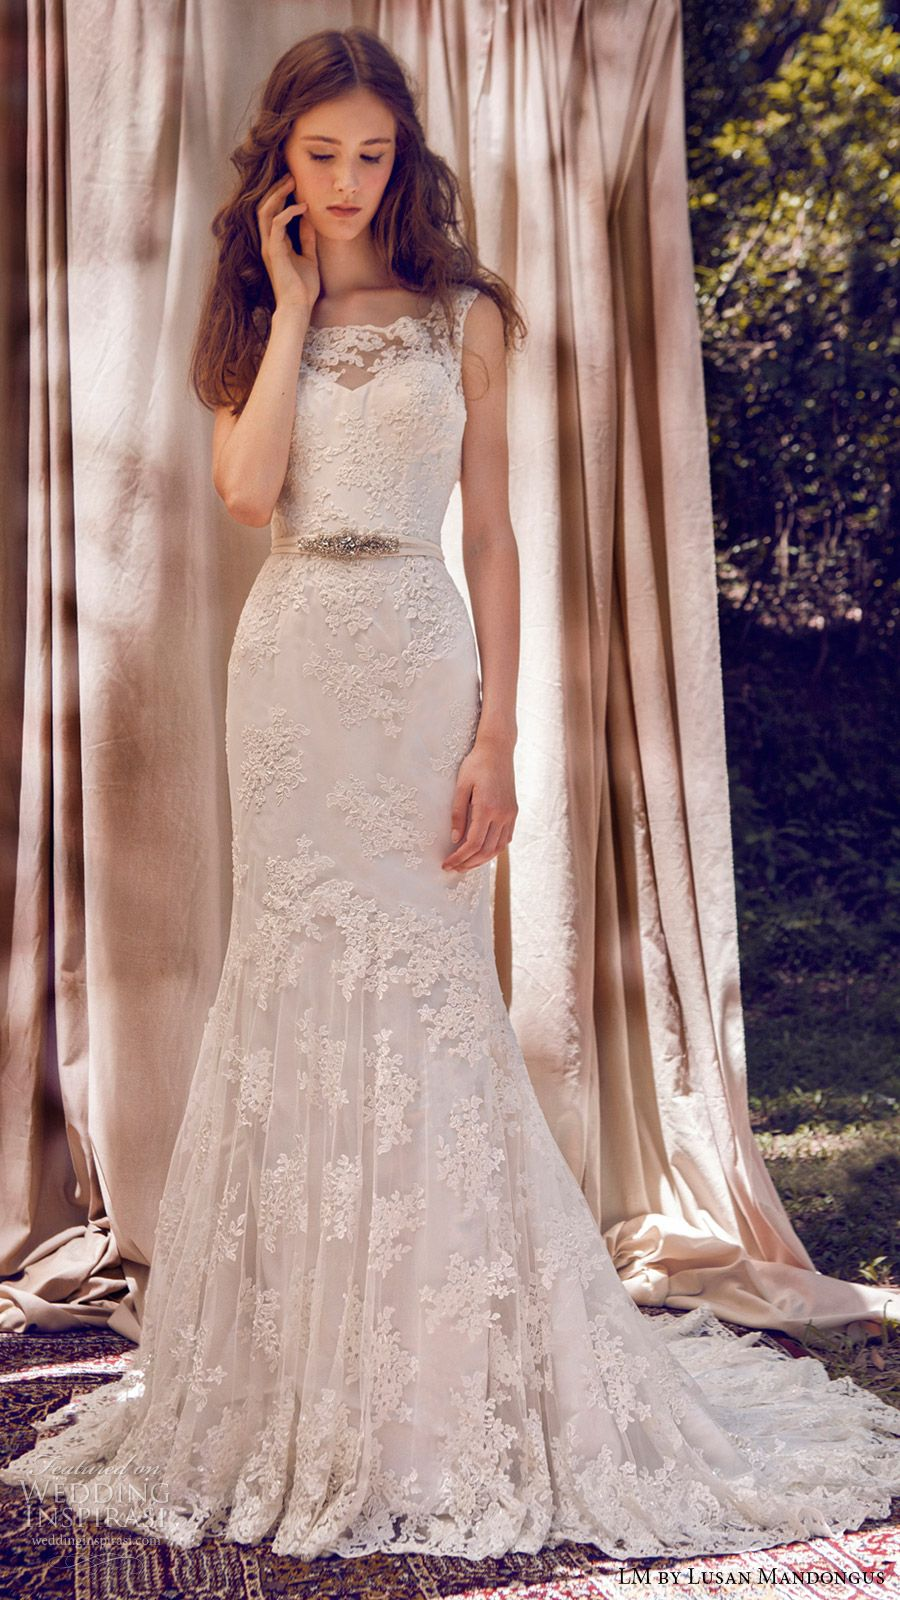 LM by Lusan Mandongus 2017 Wedding Dresses   Novios, De novia y ...